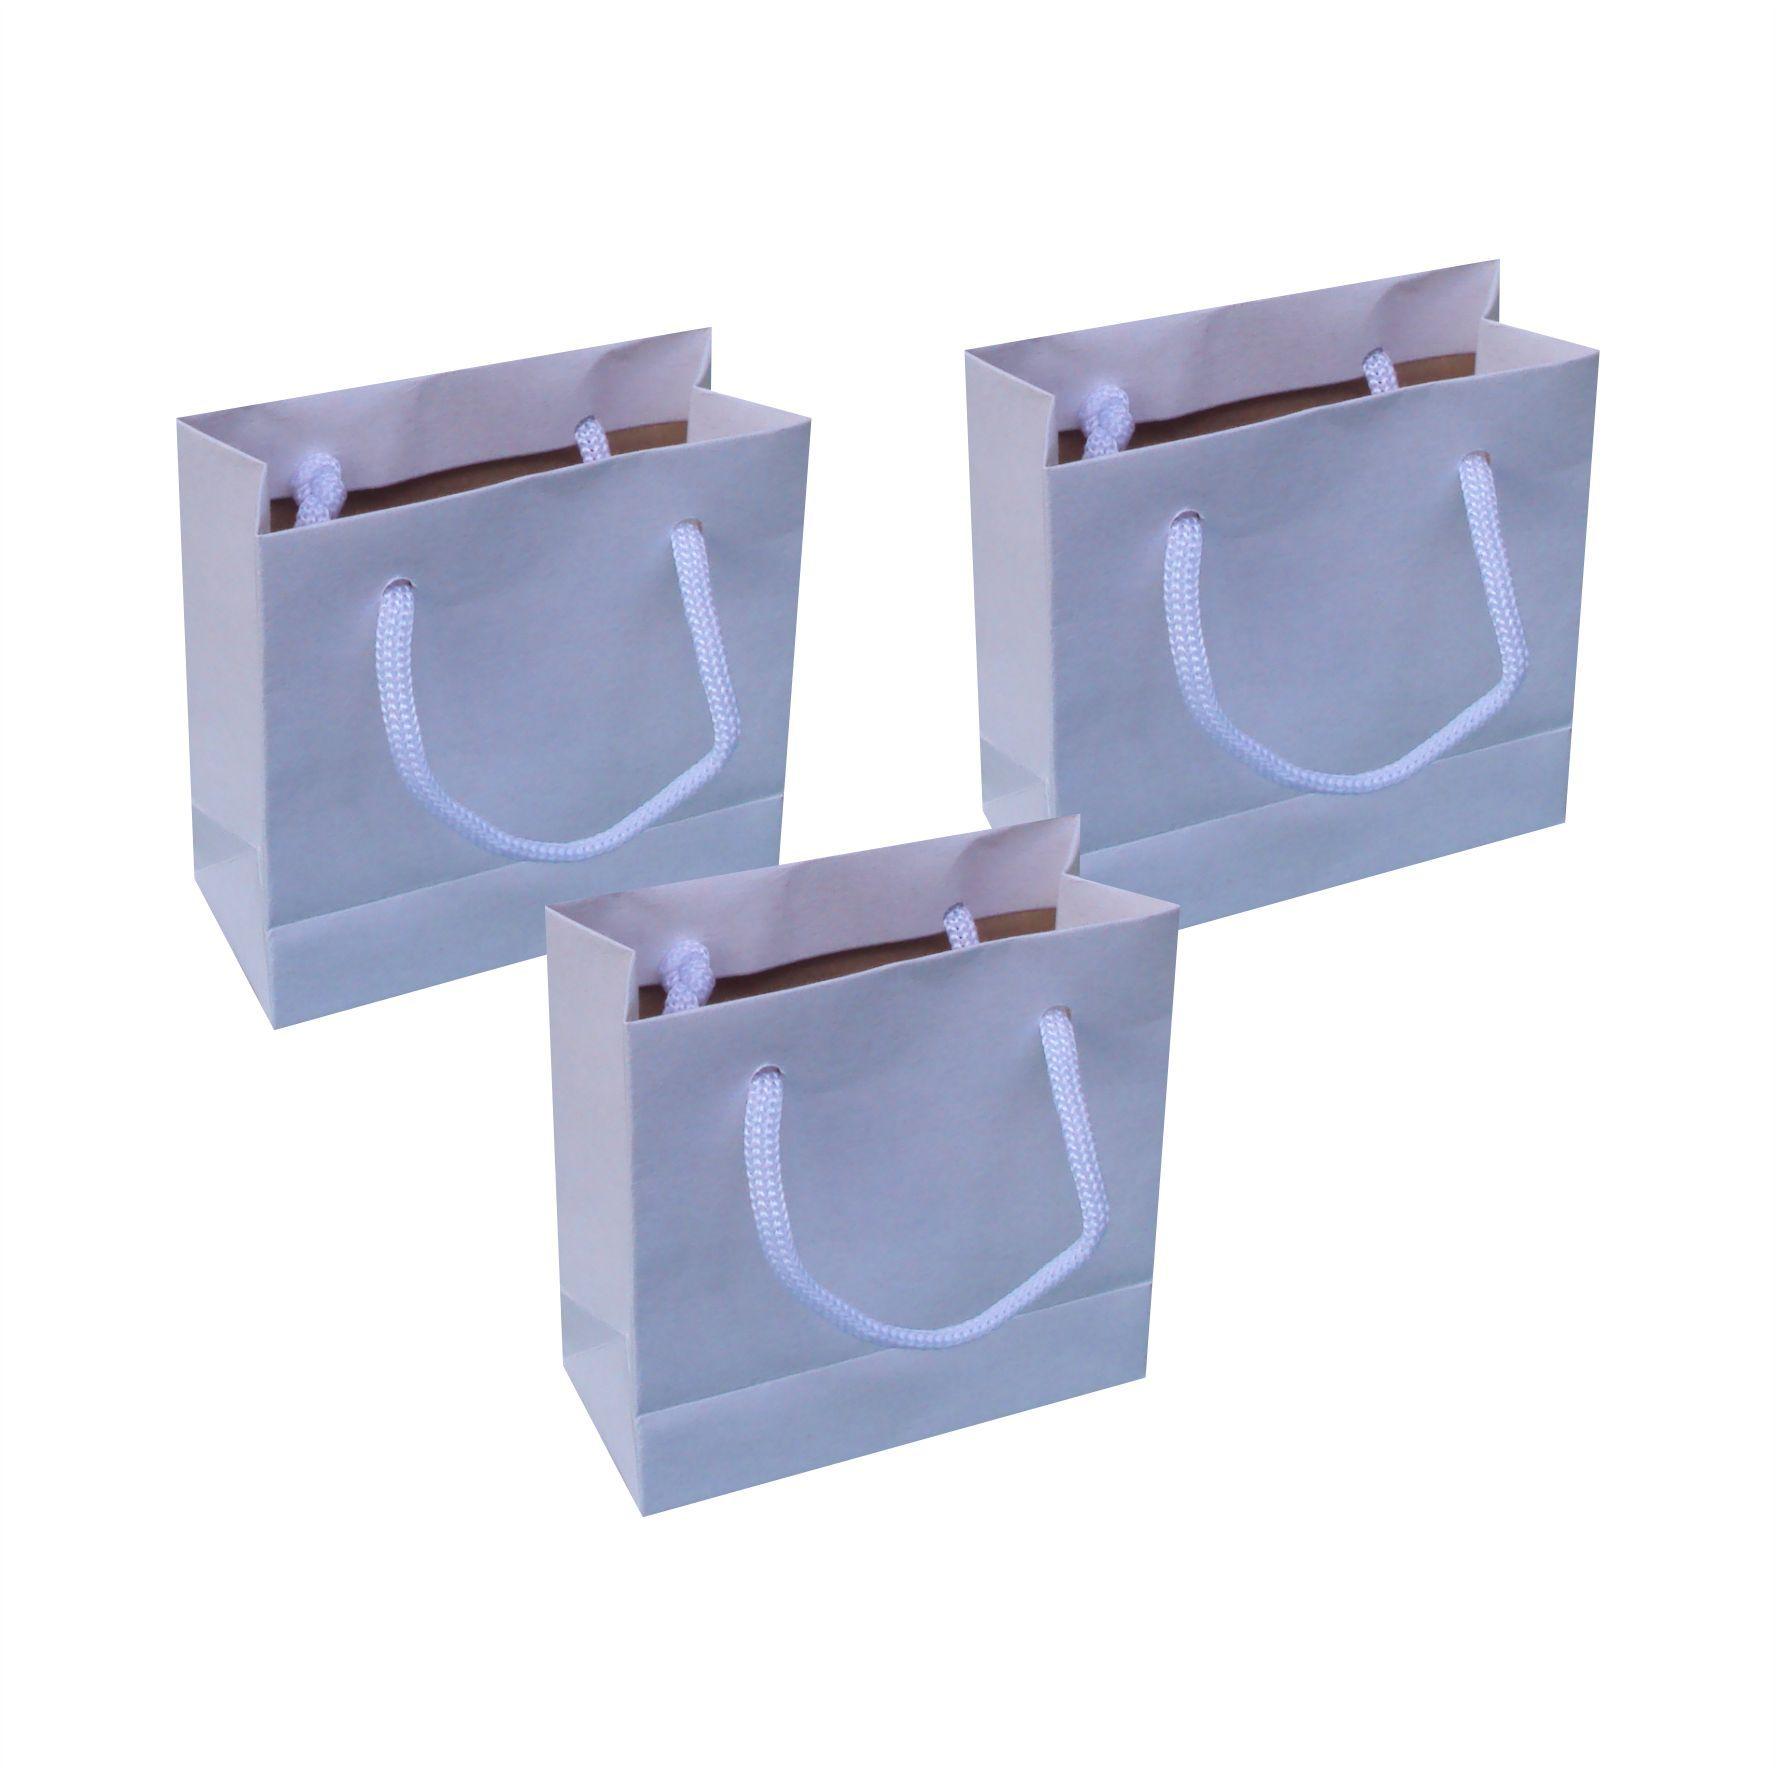 39c06822a Sacola de papel kraft mini - cor branca tamanho -10x10x4,5 cm - 10 ...